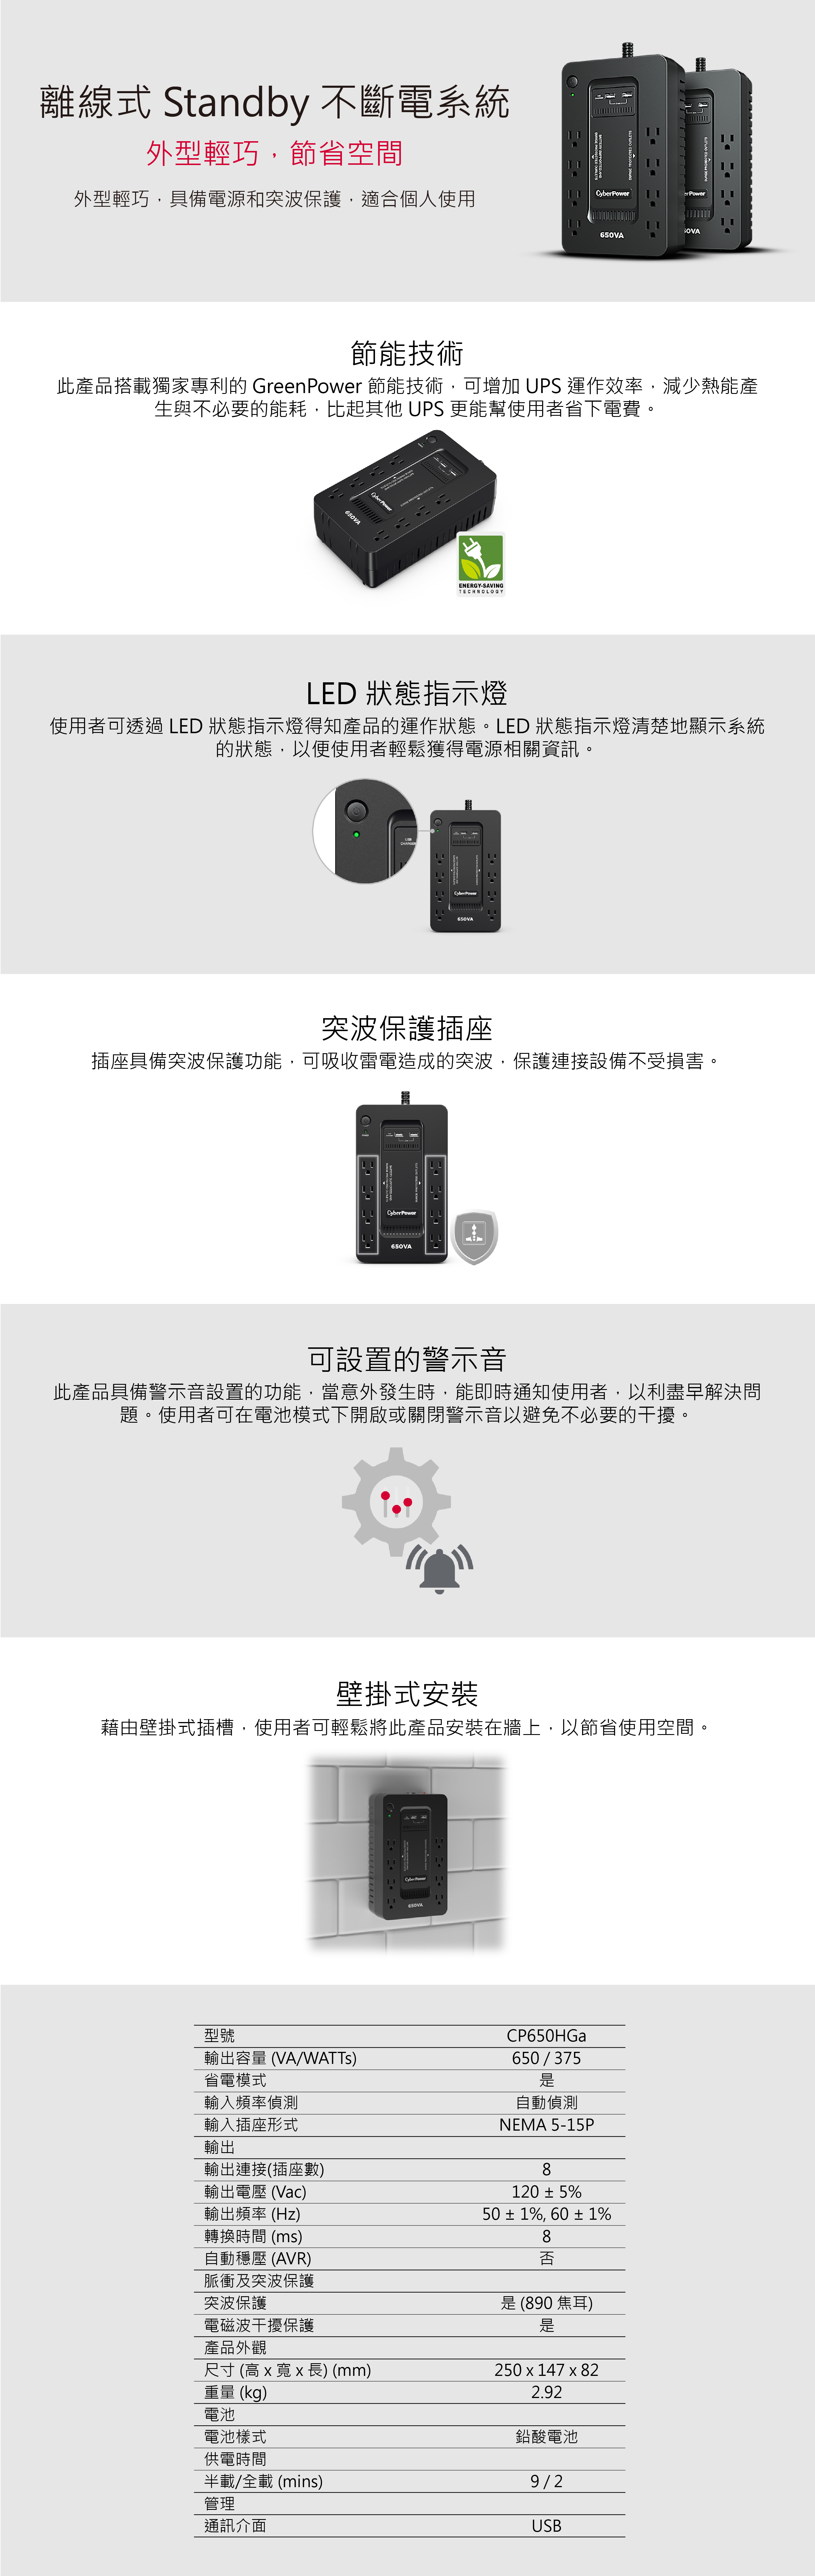 Cyberpower UPS CP650HGa 商品介紹